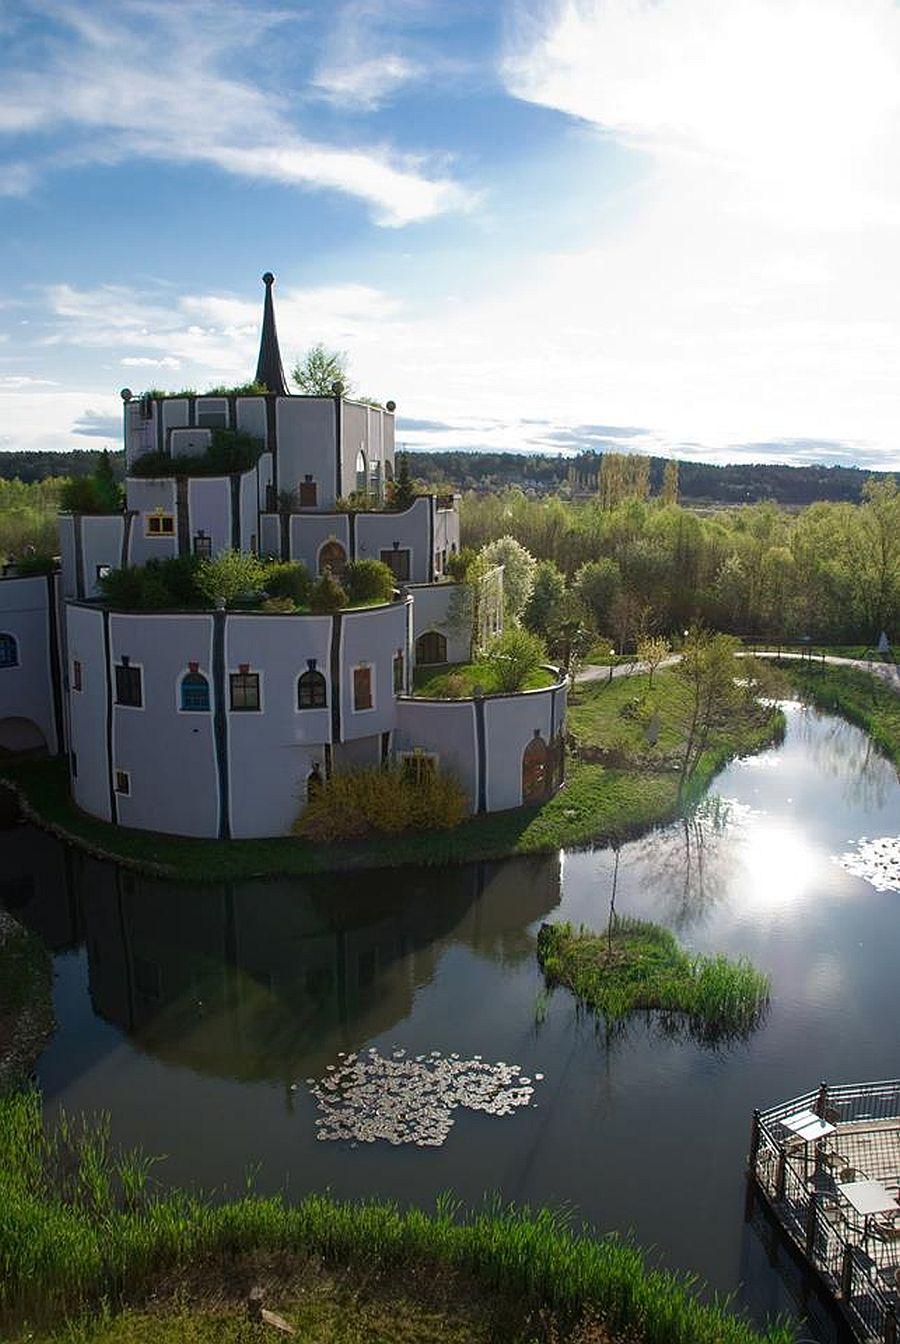 adelaparvu.com despre statiunea Rogner Bad Blumau, Austria, arhitect Friedensreich Hundertwasser (19)